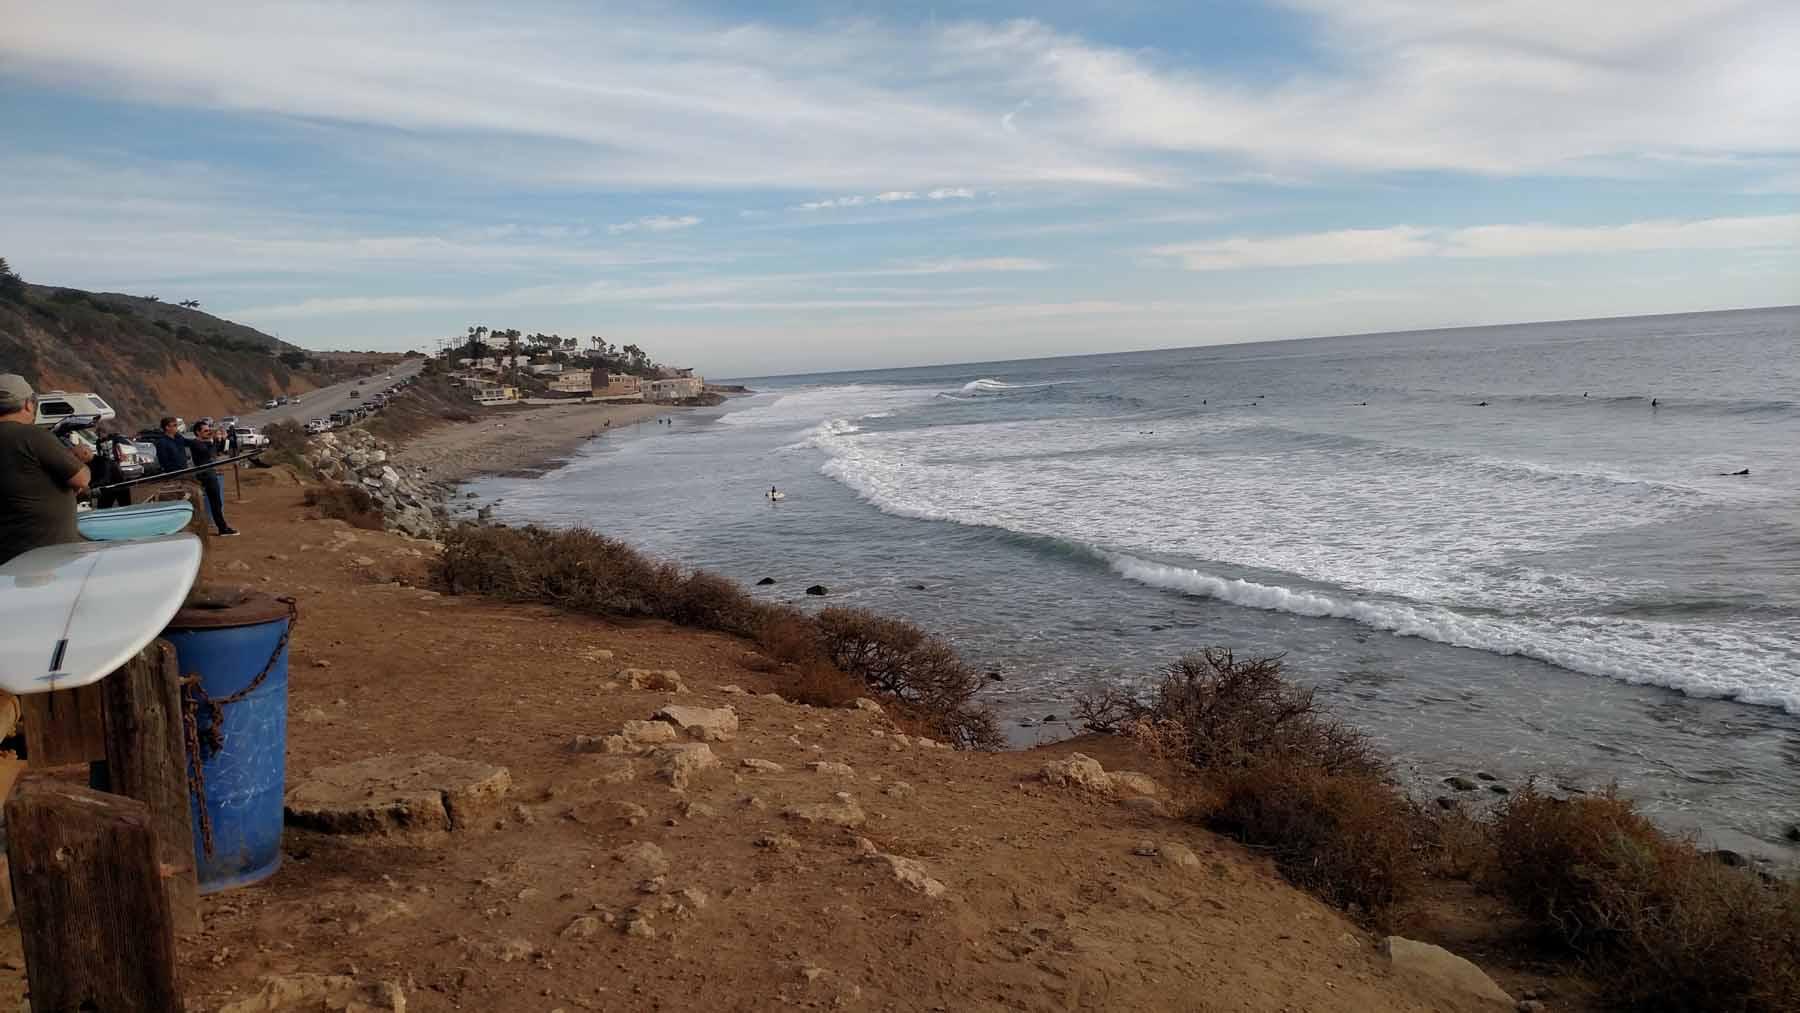 Passing by the surfers at El Matador.